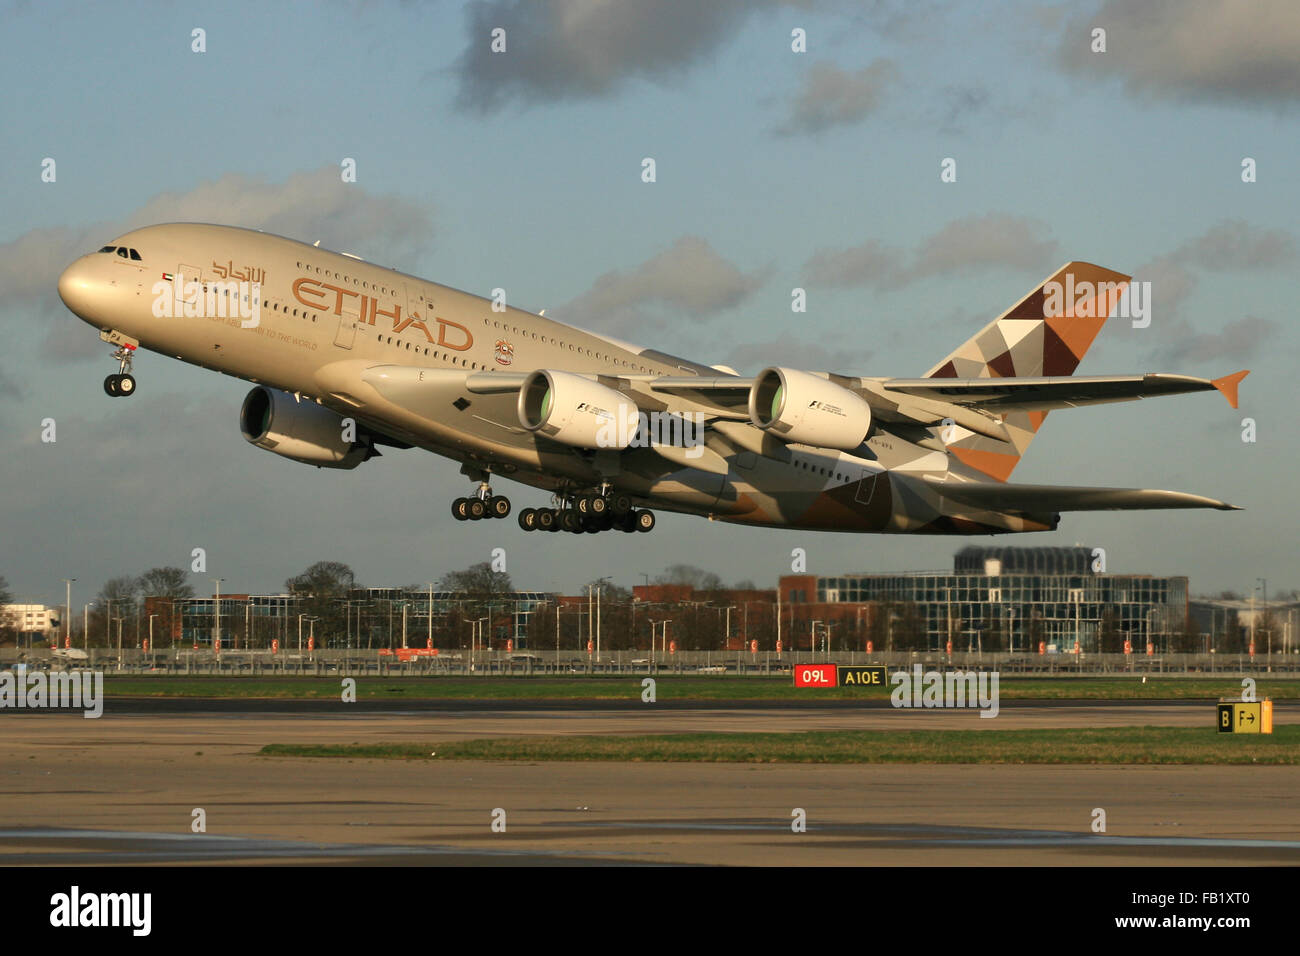 etihad a380 - Stock Image